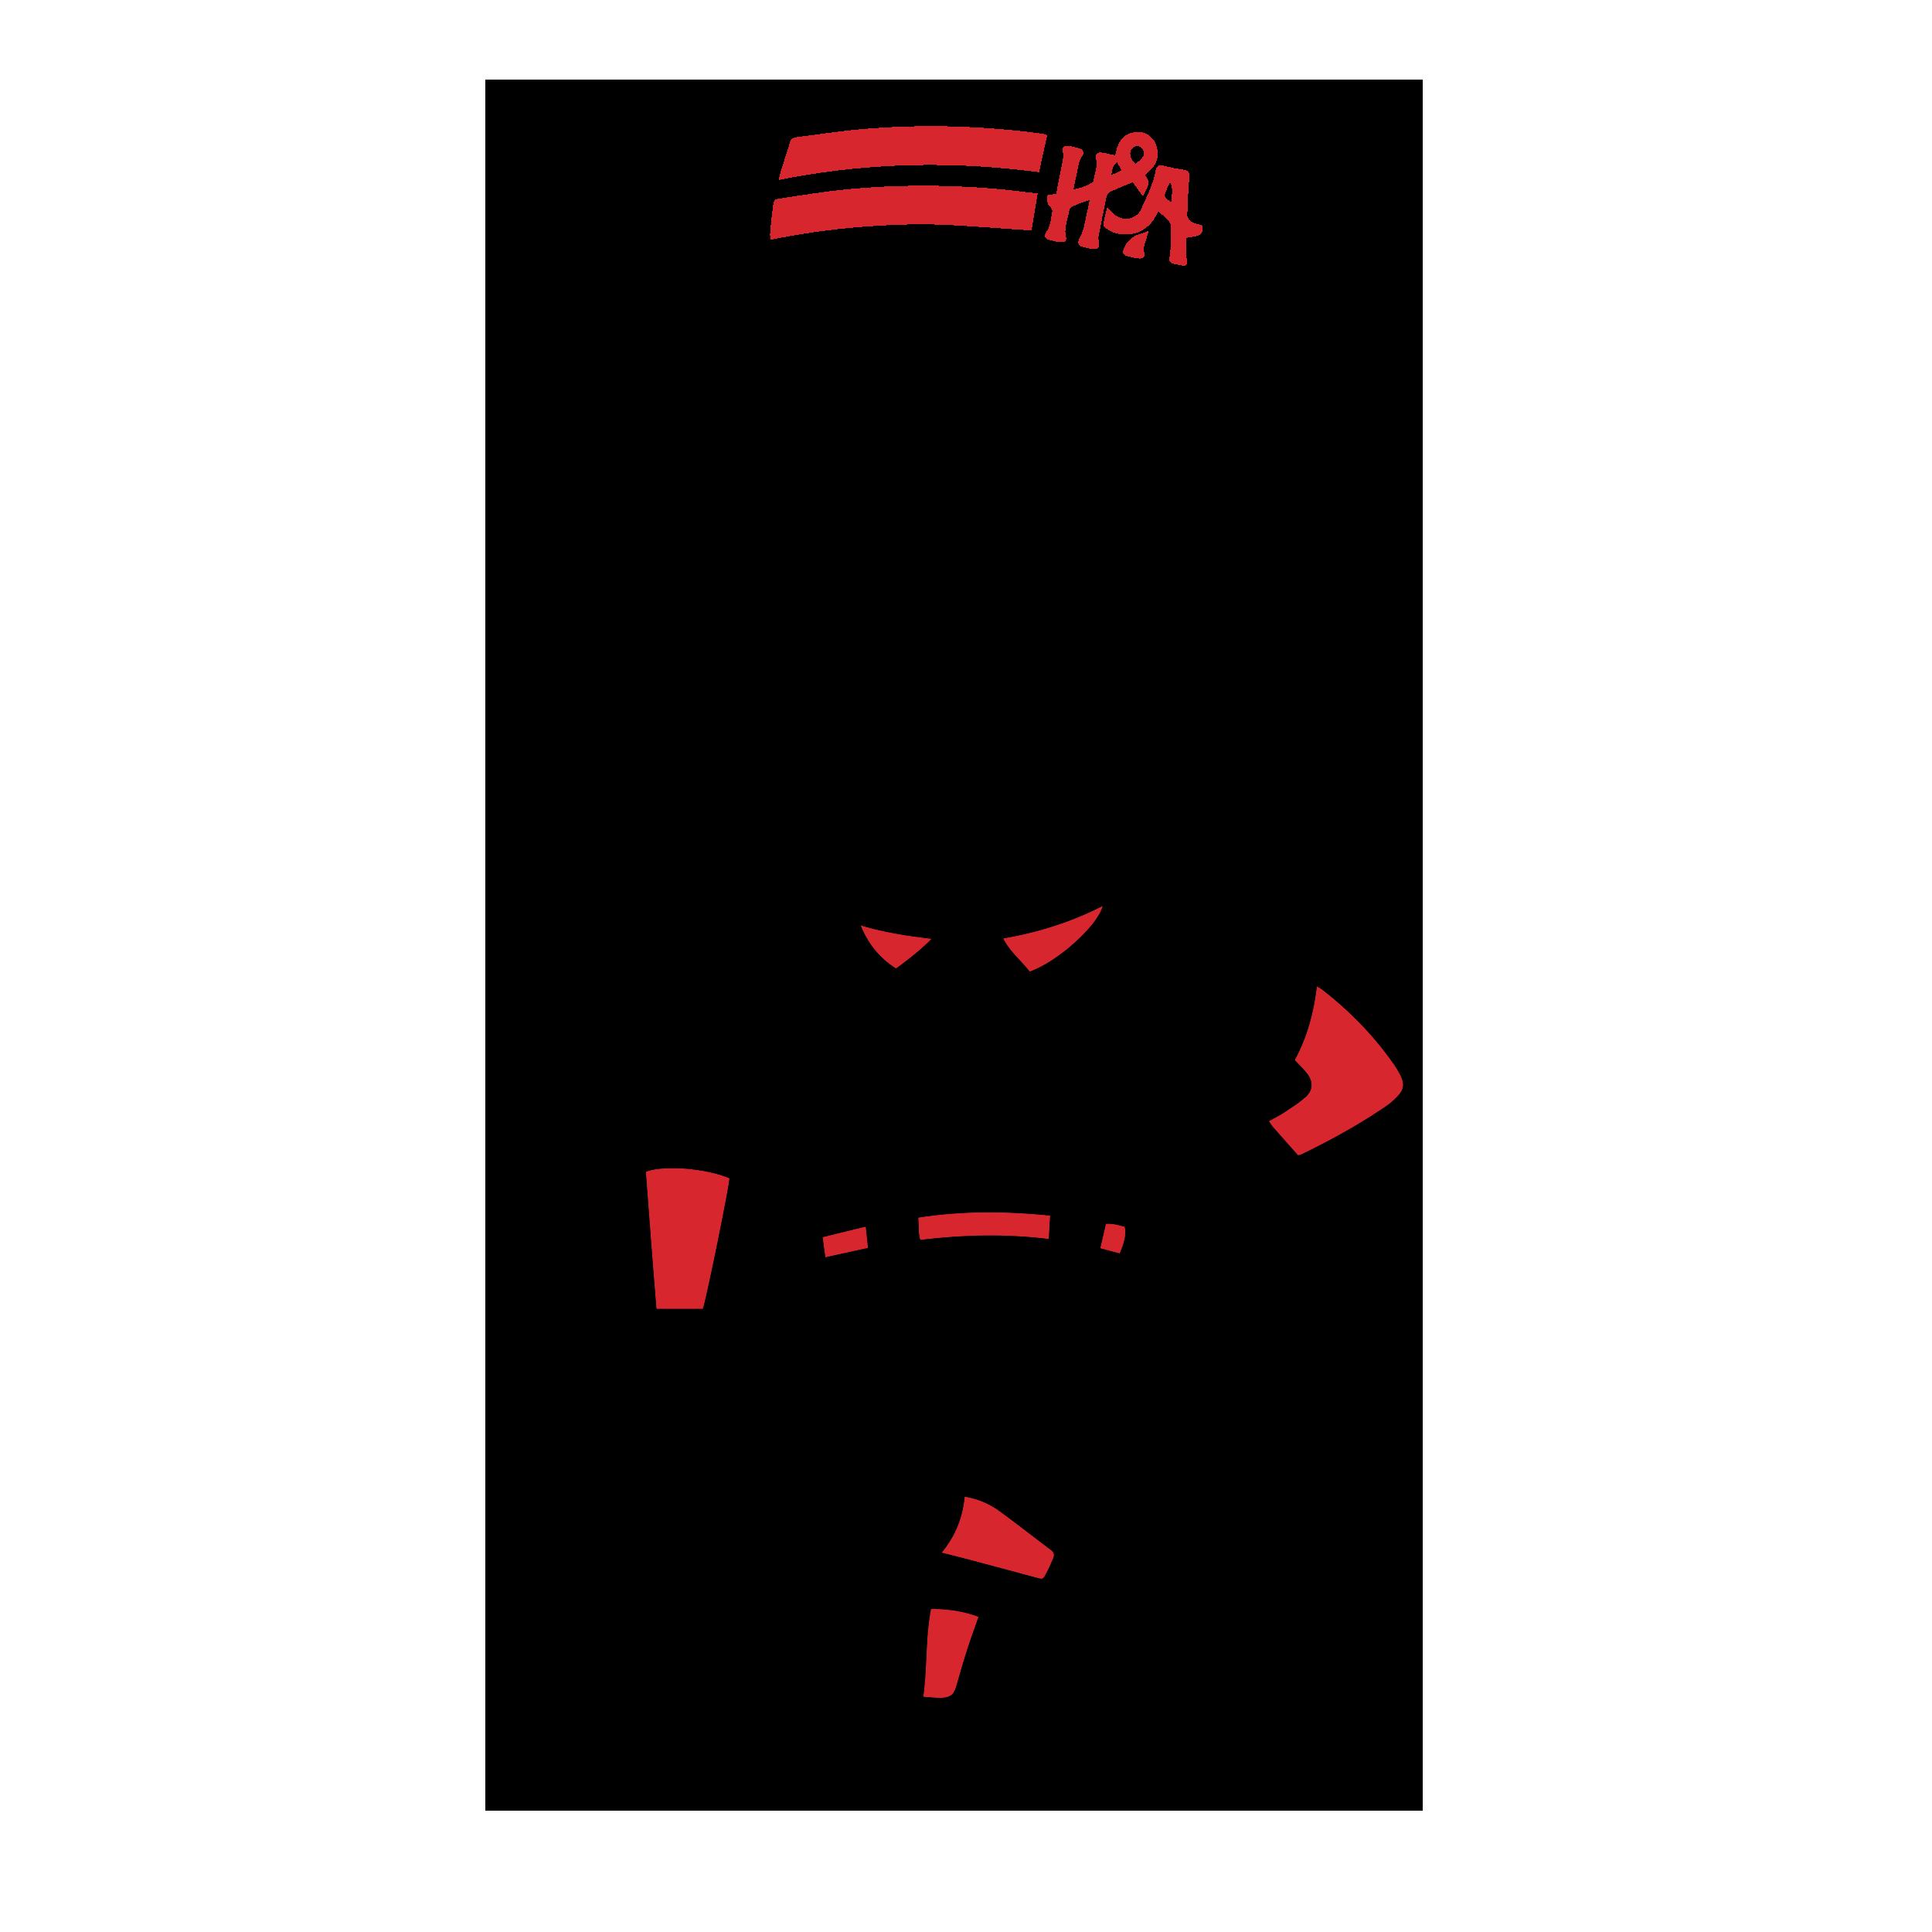 H&A_Mascot.png